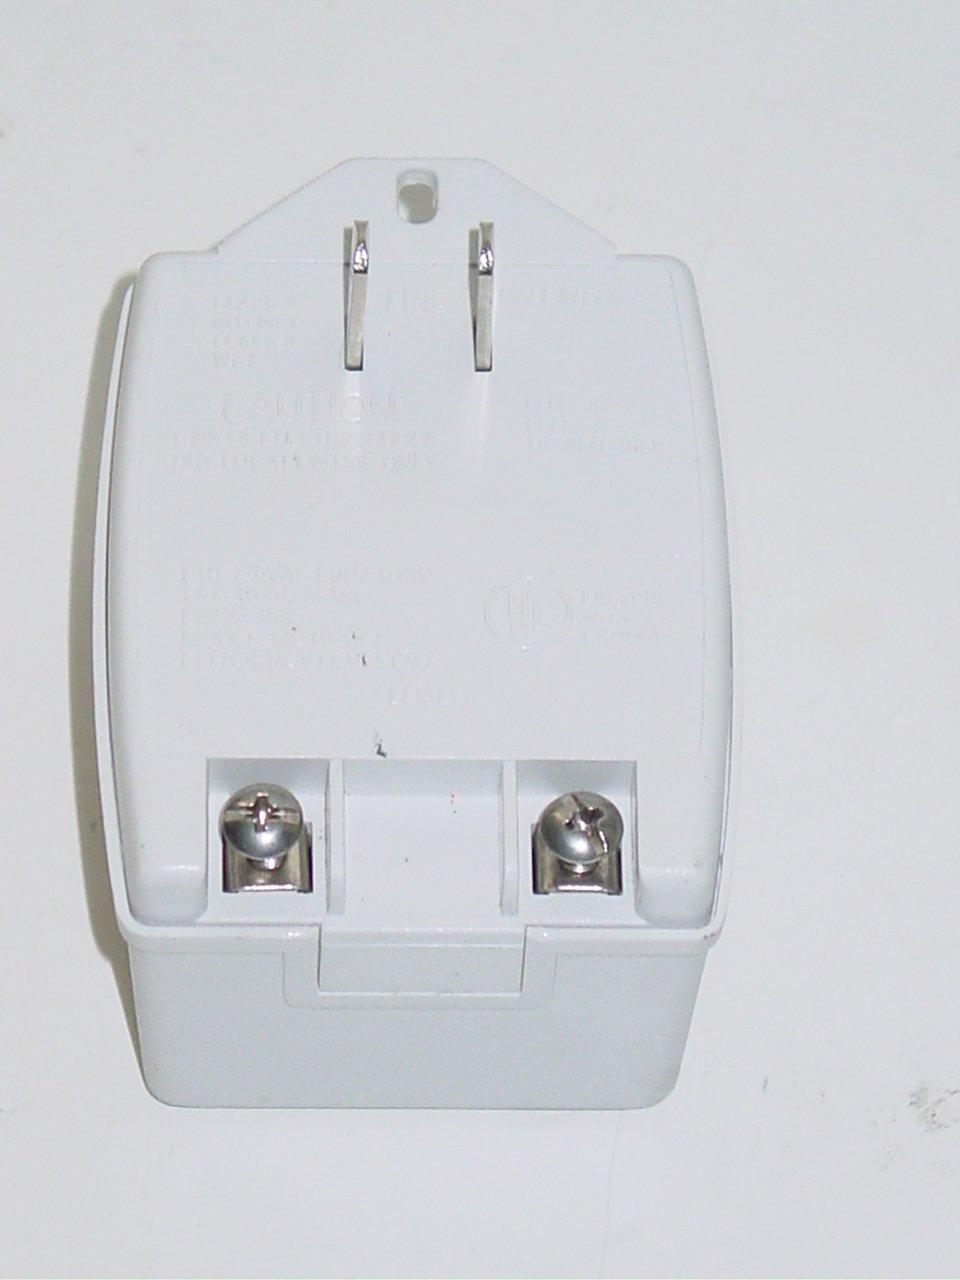 GE Simon XT Alarm System AC Adapter 22-155 9VAC 25VA MGT925CC